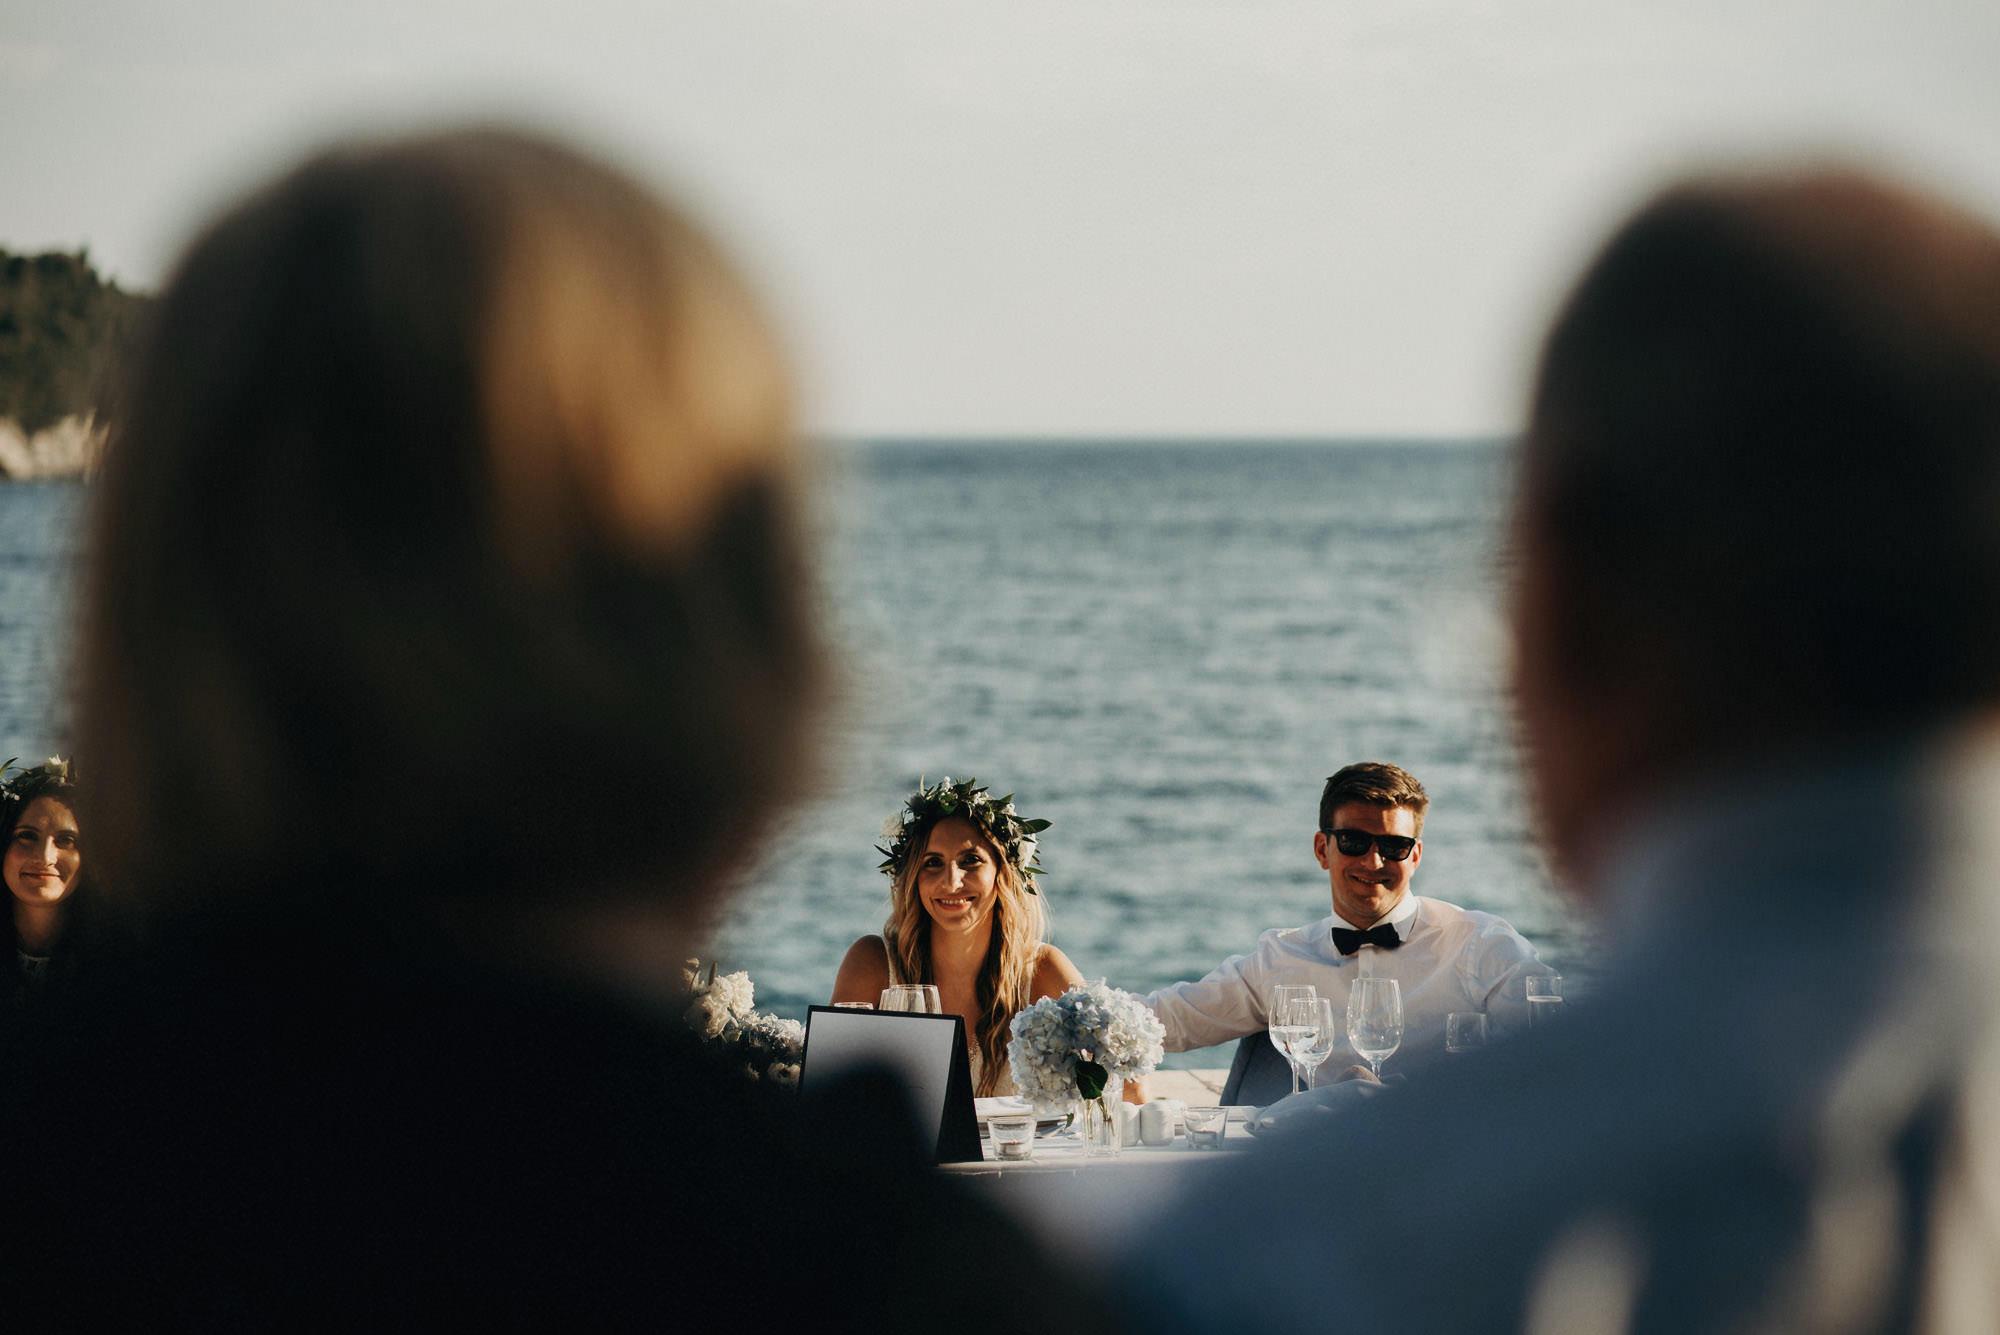 dubrovnik_croatia_wedding_photographer-jere_satamo-destination_weddings-060-web.jpg